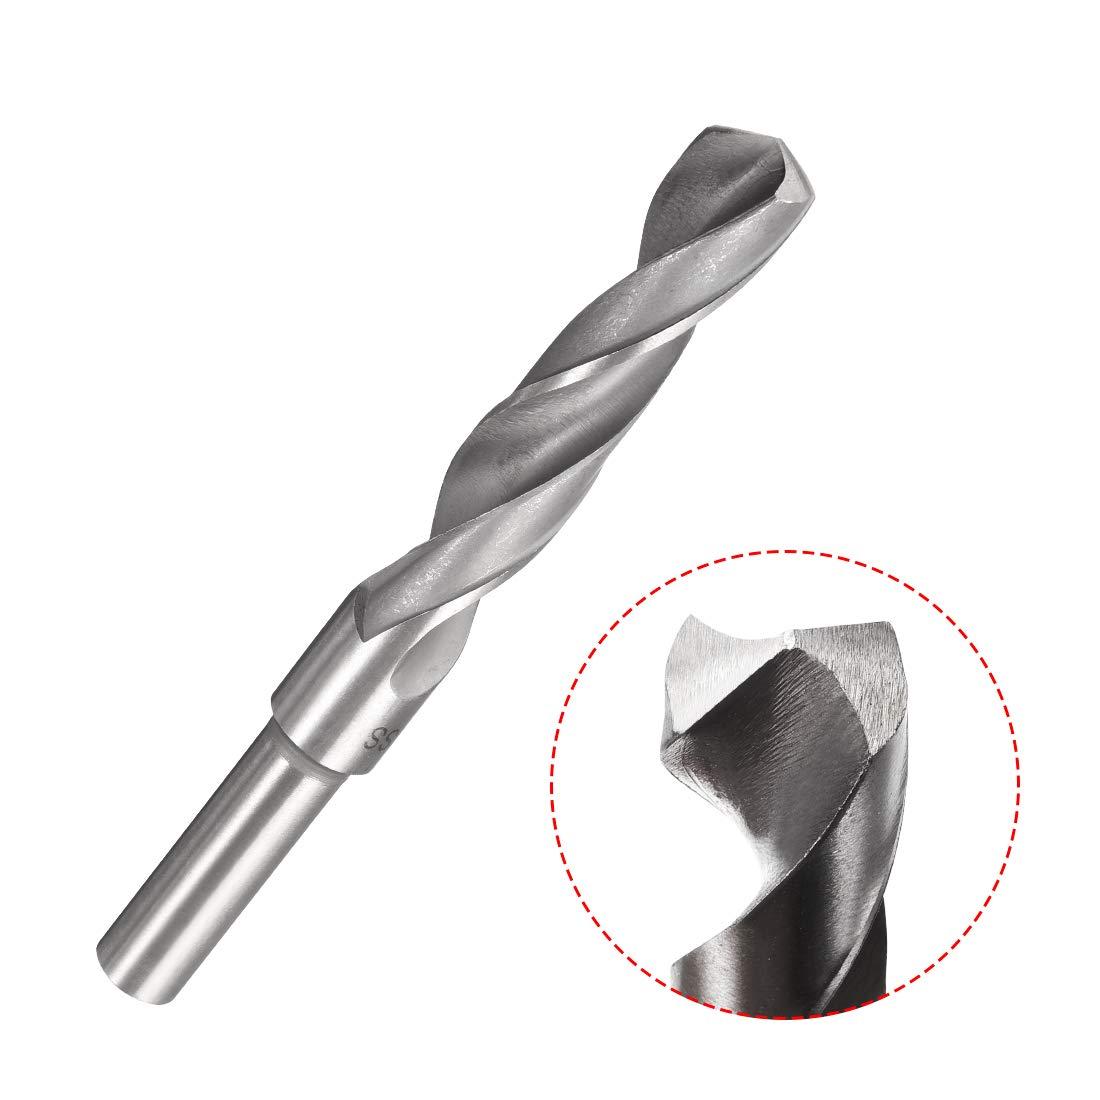 uxcell 1//2 Straight Shank 16mm Drill Bit HSS 4241 Silver